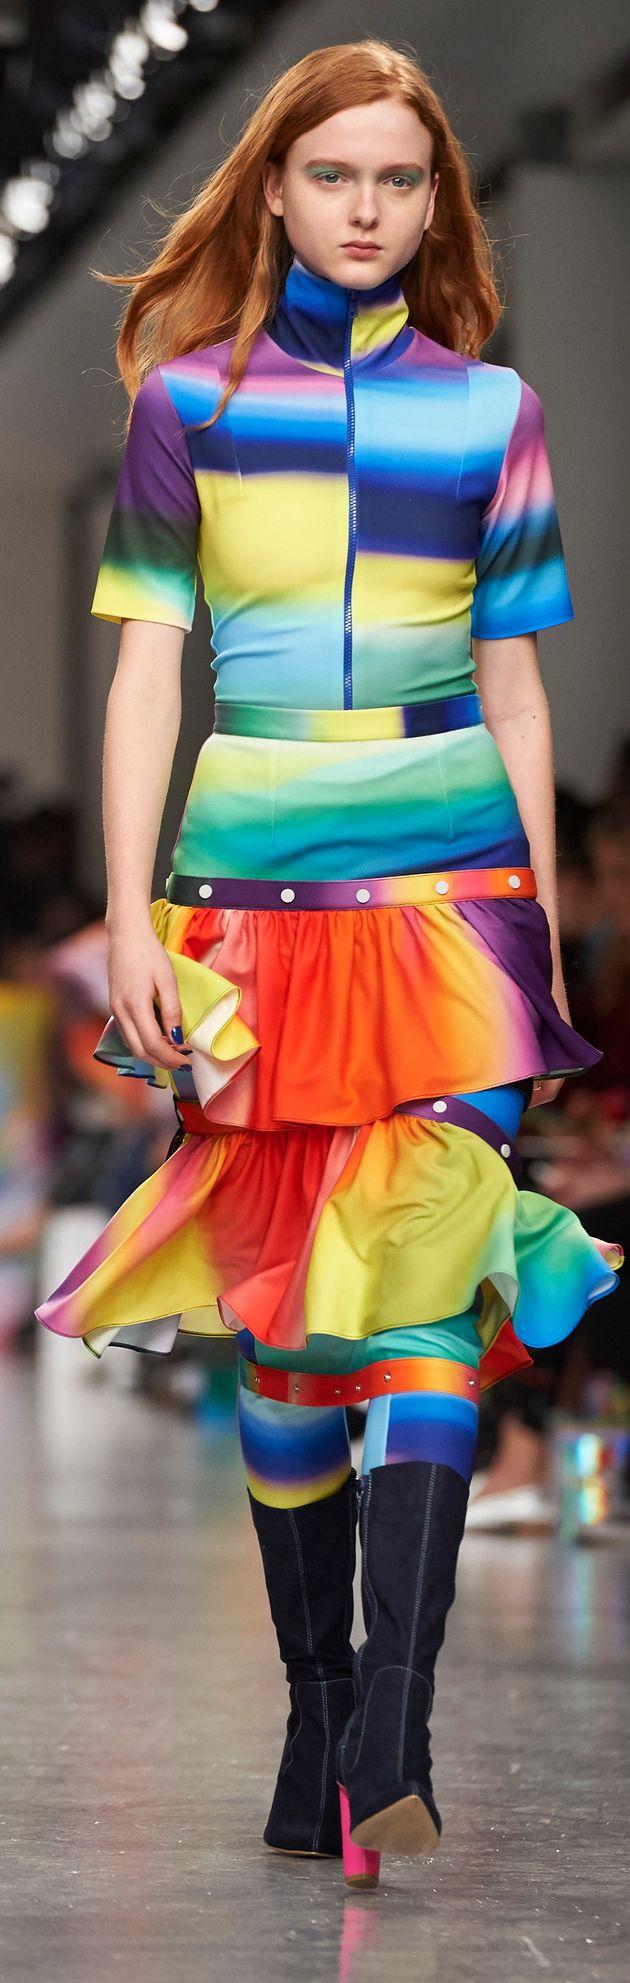 London Fashion Week 2017: Post-It Notes Made Their Runway Debut At Fyodor